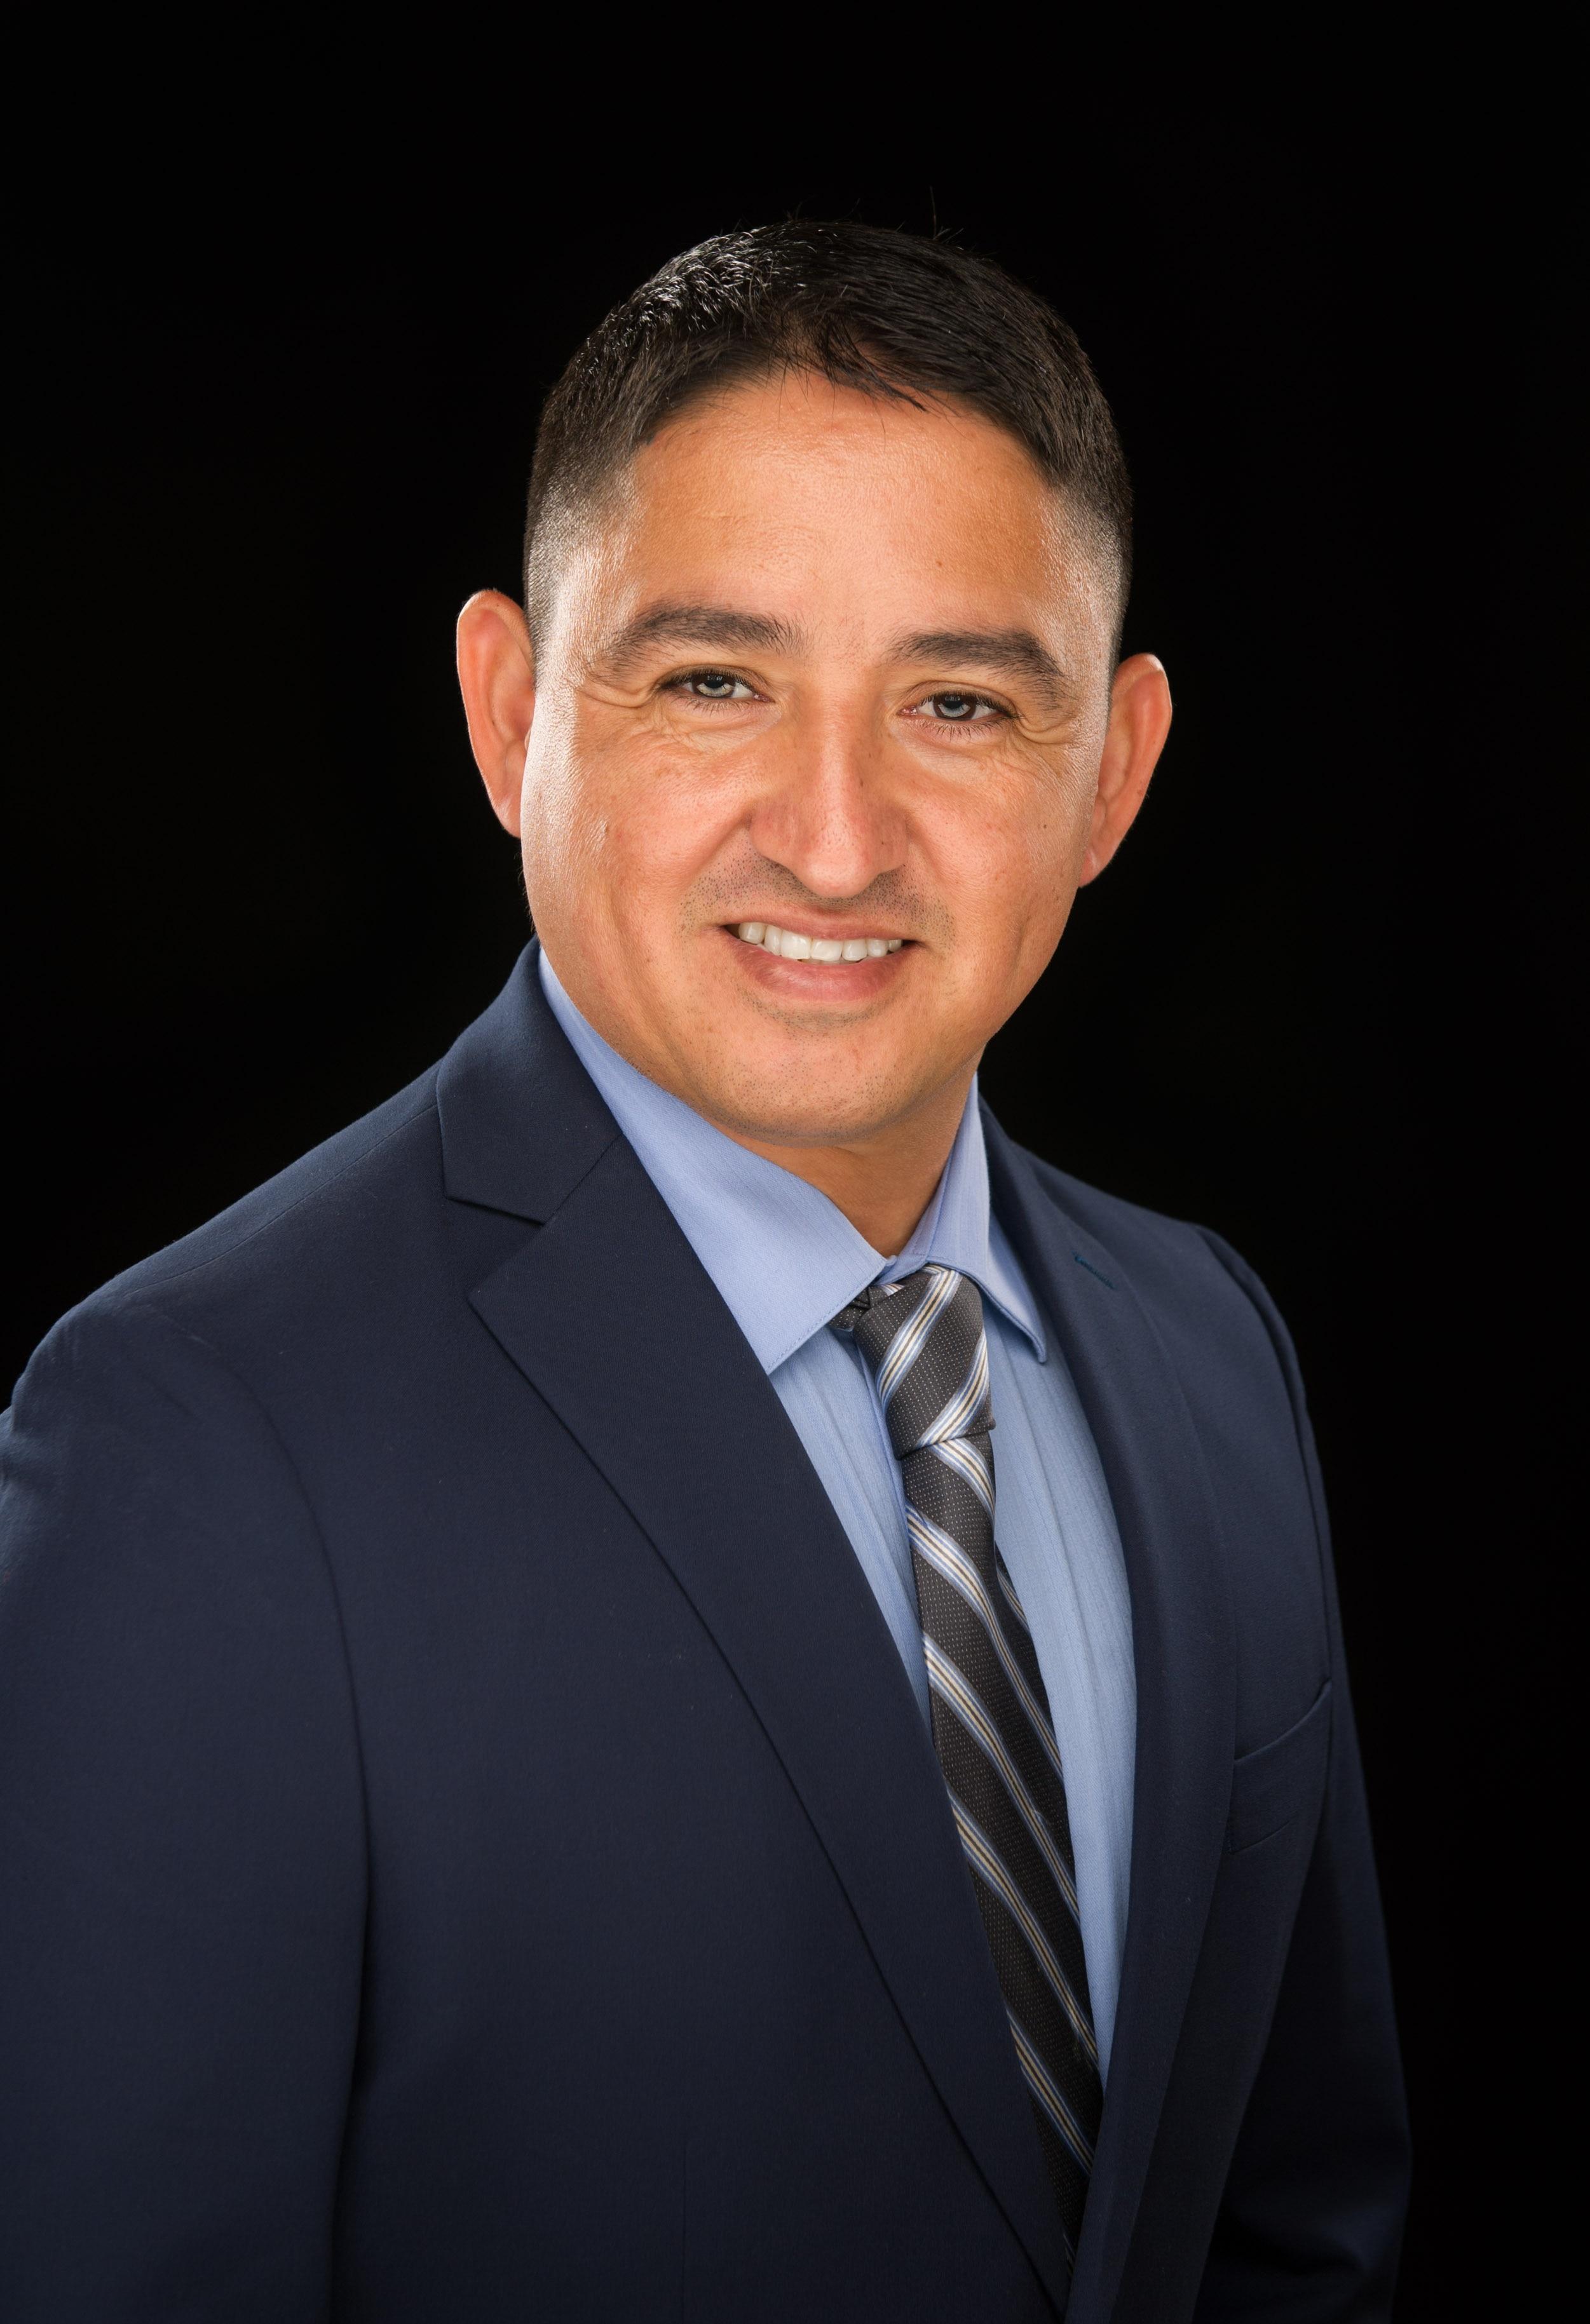 REYNALDO GALVAN Financial Professional & Insurance Agent